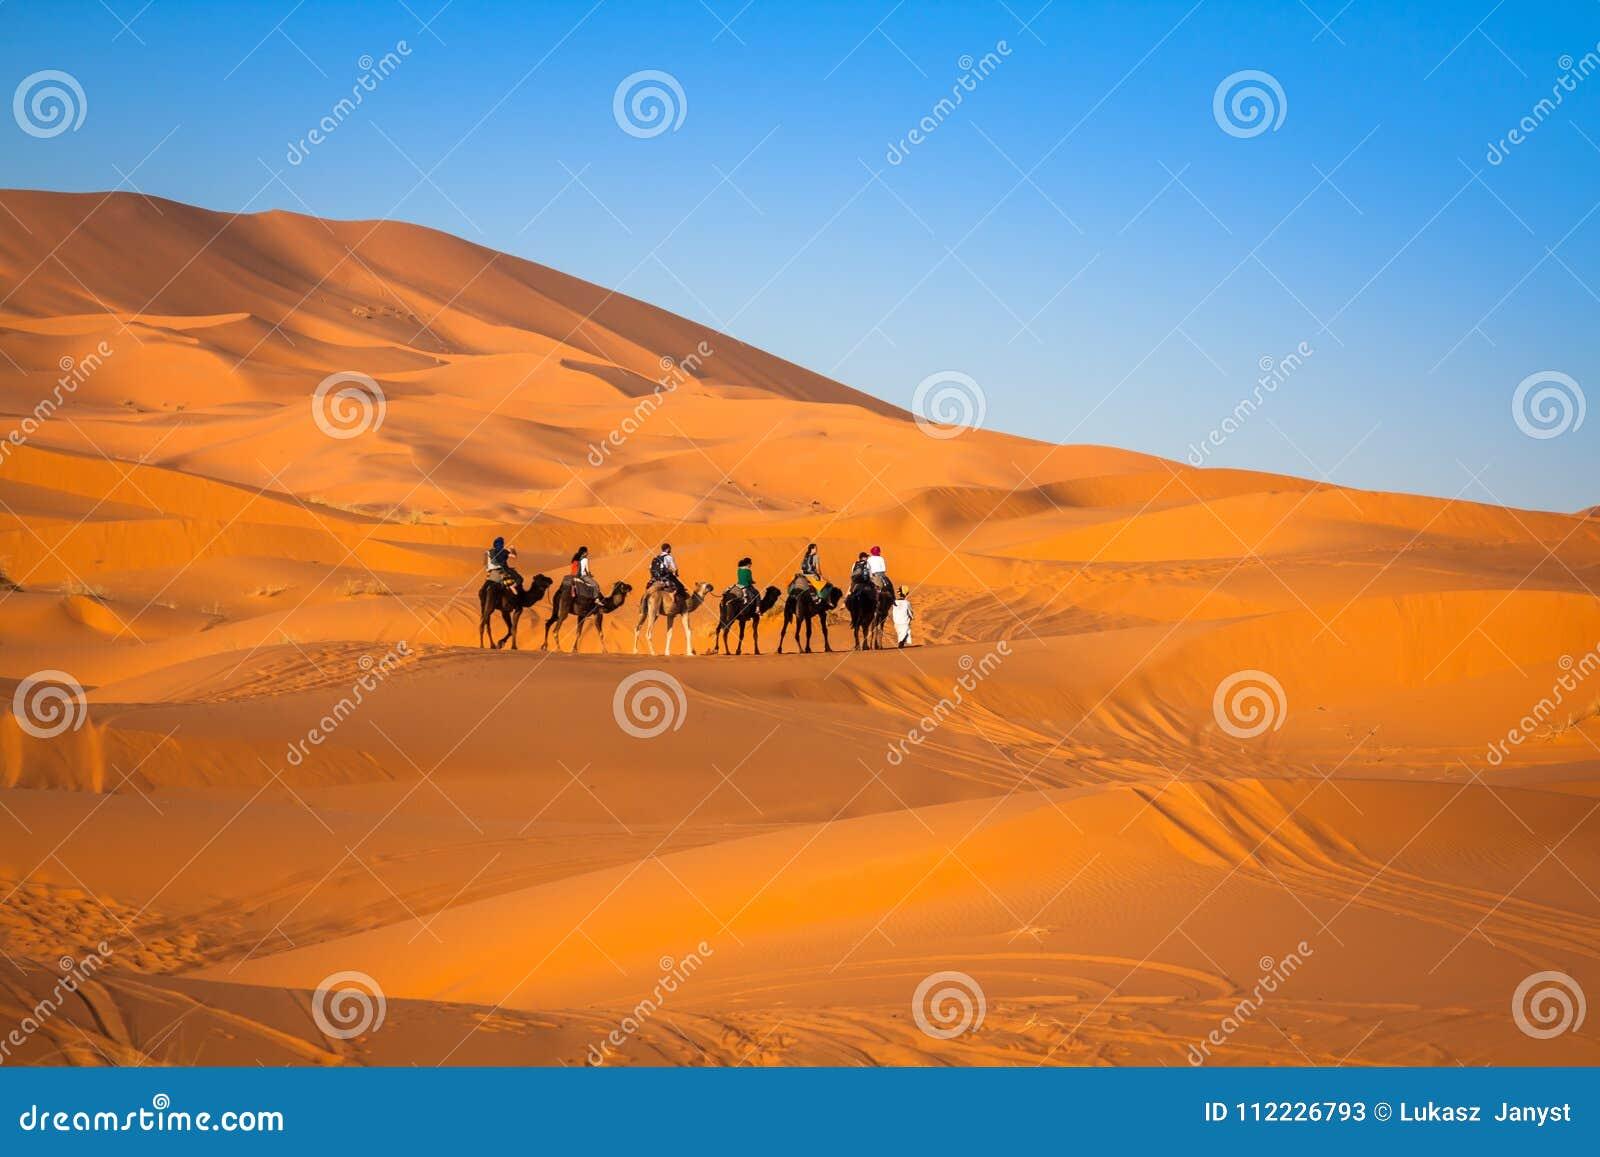 Download Camel Caravan Going Through The Sand Dunes In The Sahara Desert, Stock Image - Image of drift, africa: 112226793